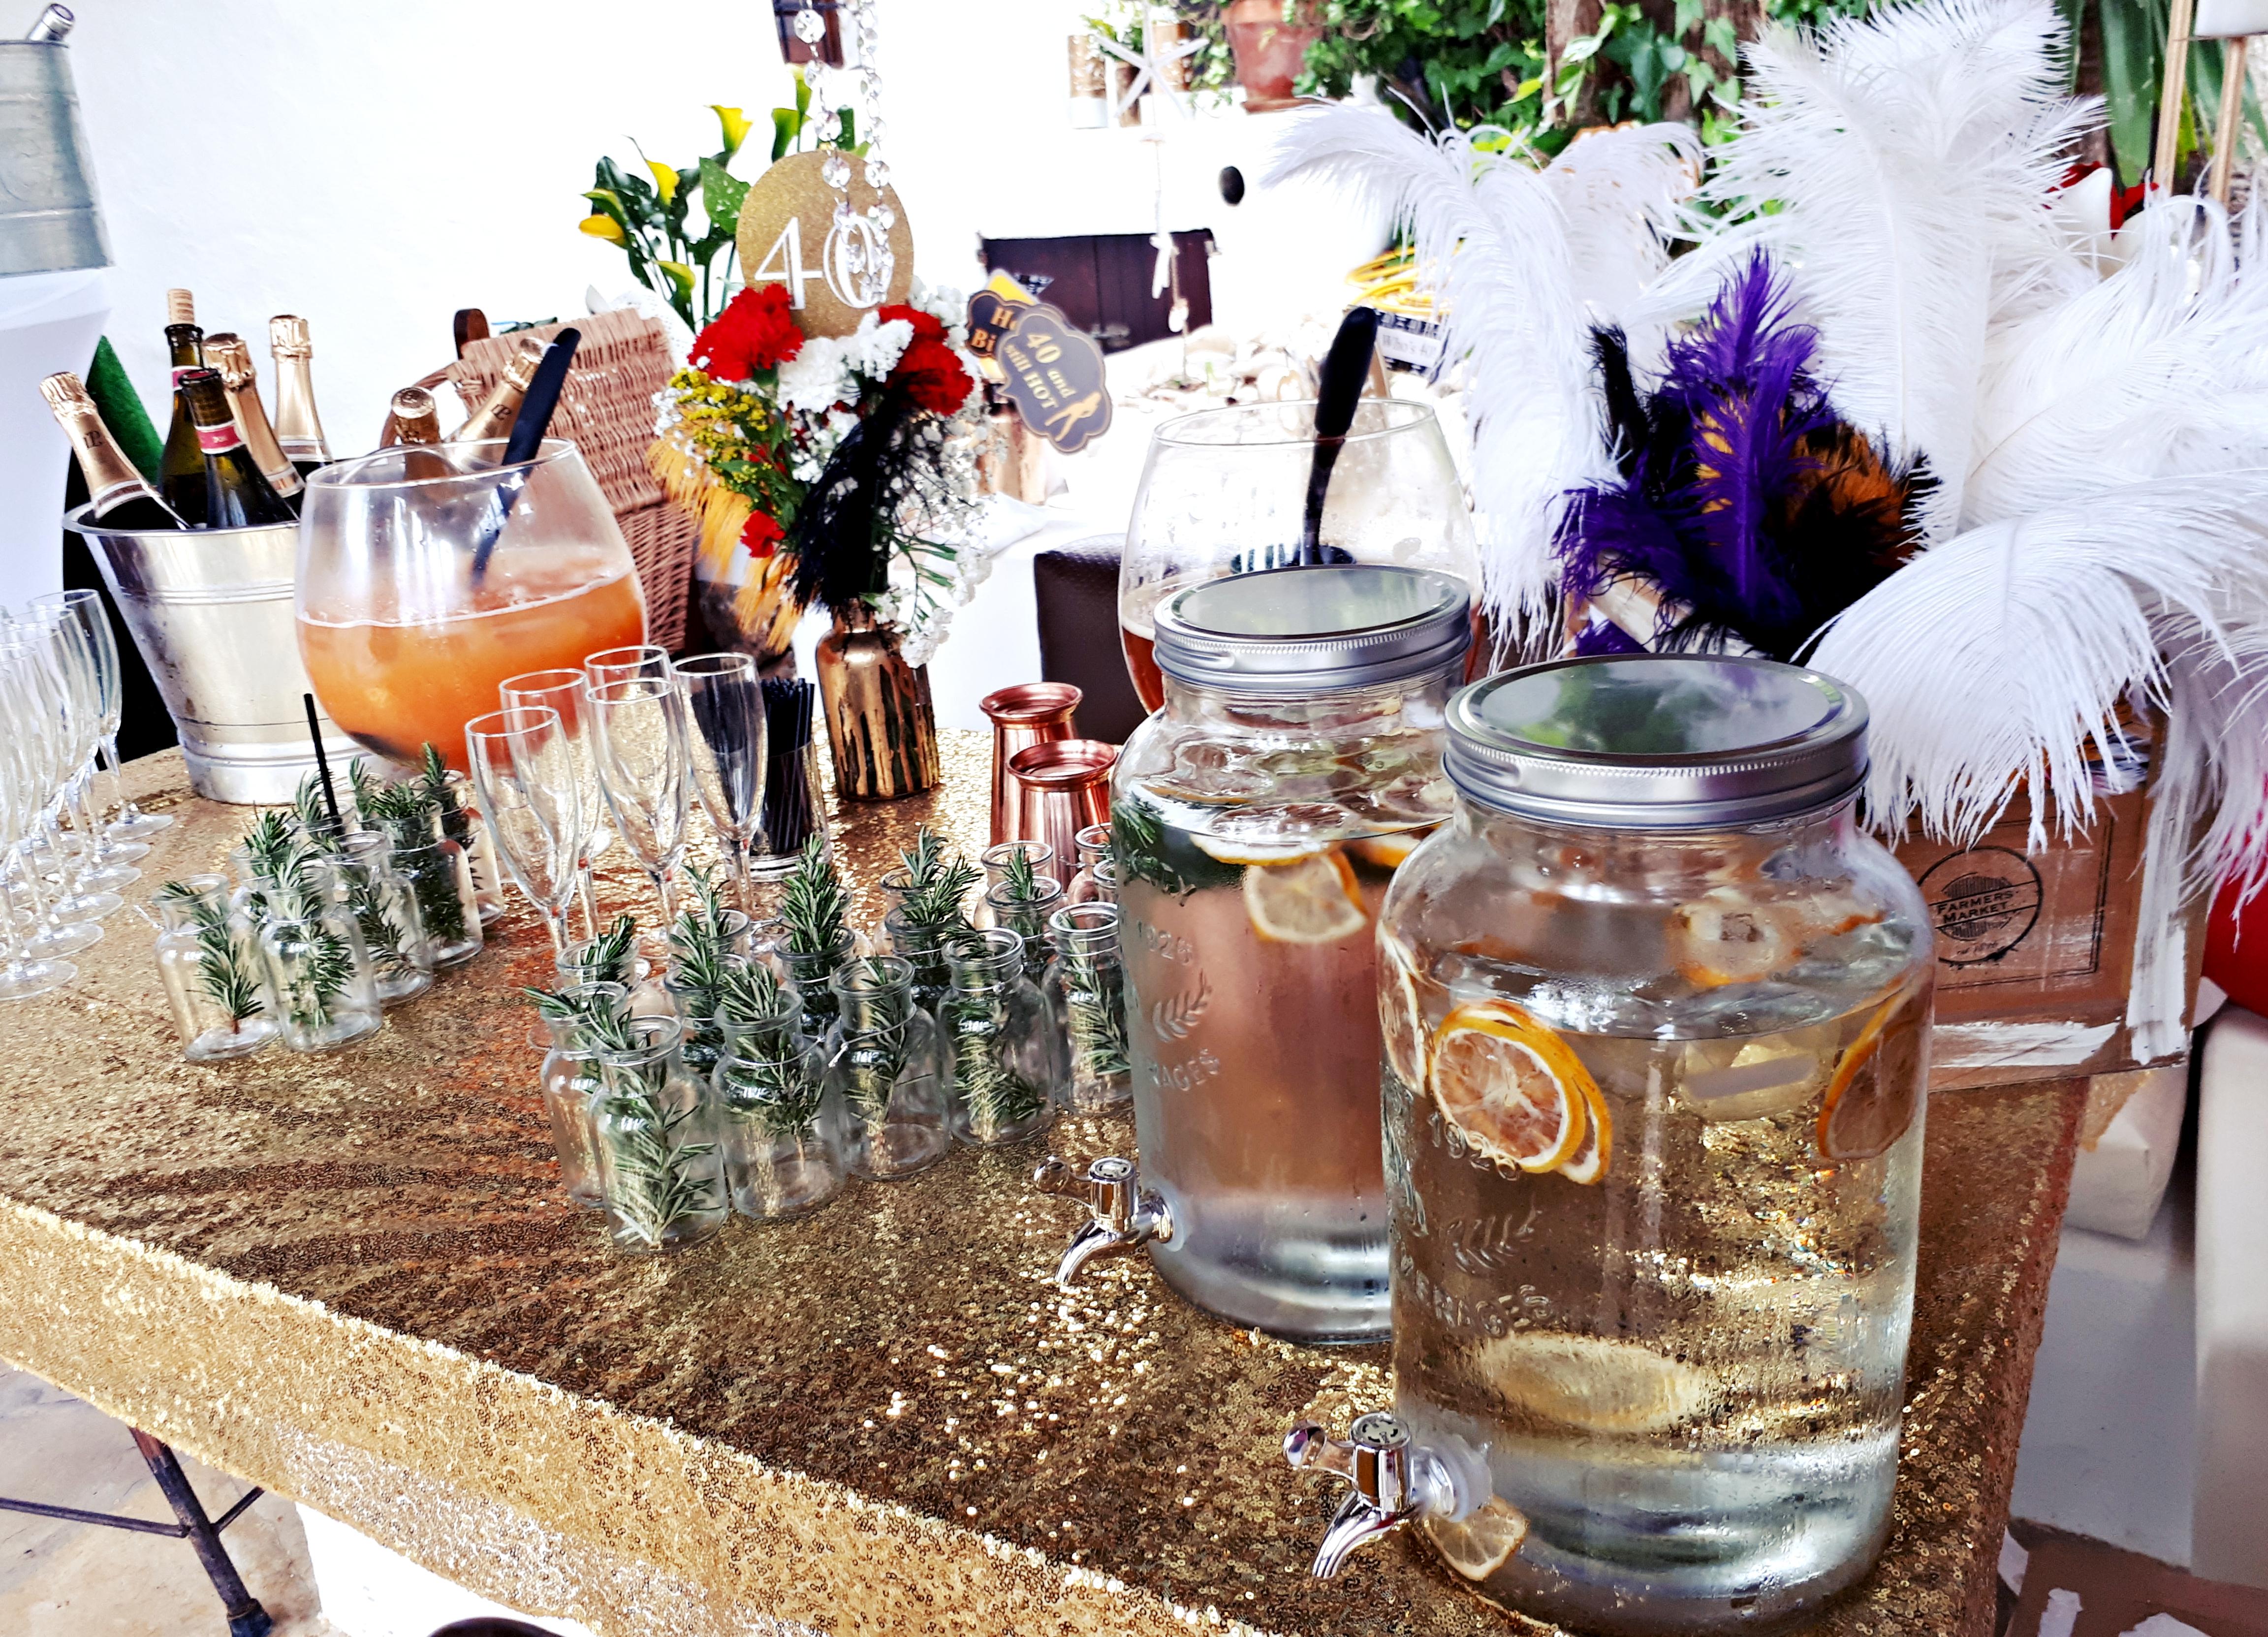 Catering Ibiza, Open bar service, private services in Ibiza Formentera, freelance bartenders, mobile